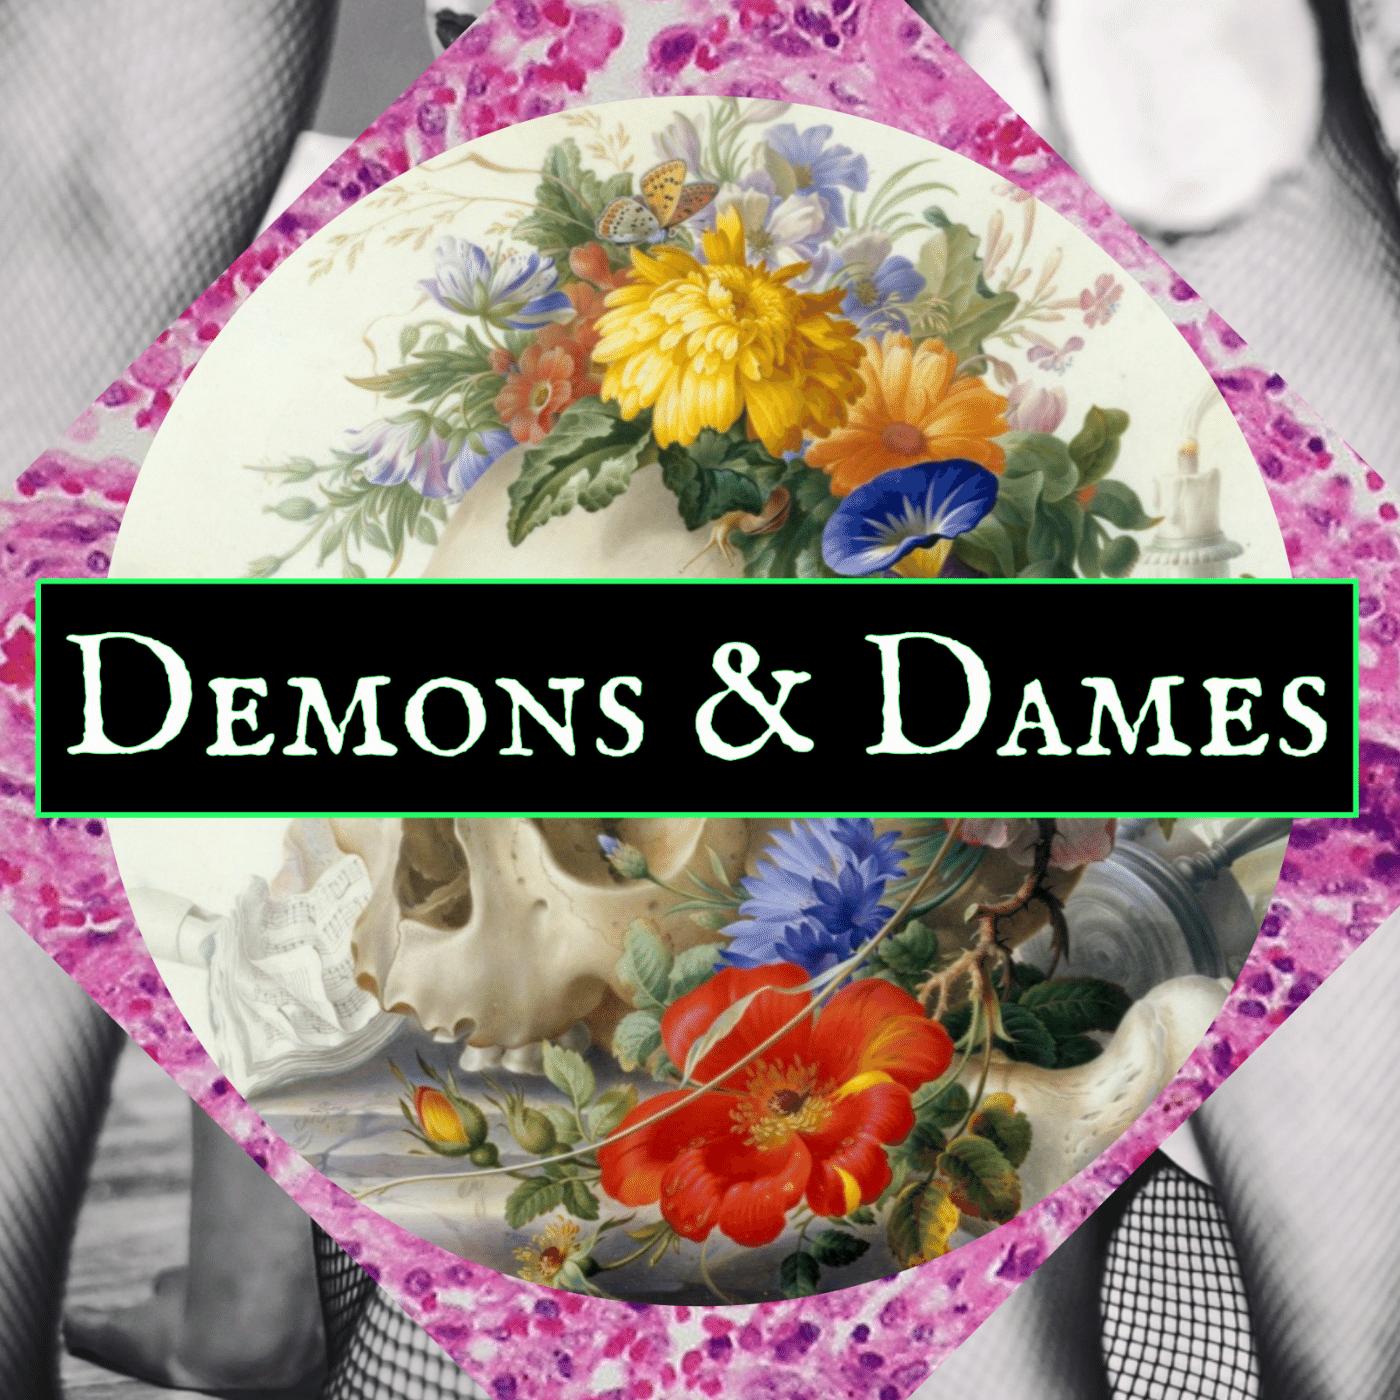 Demons & Dames